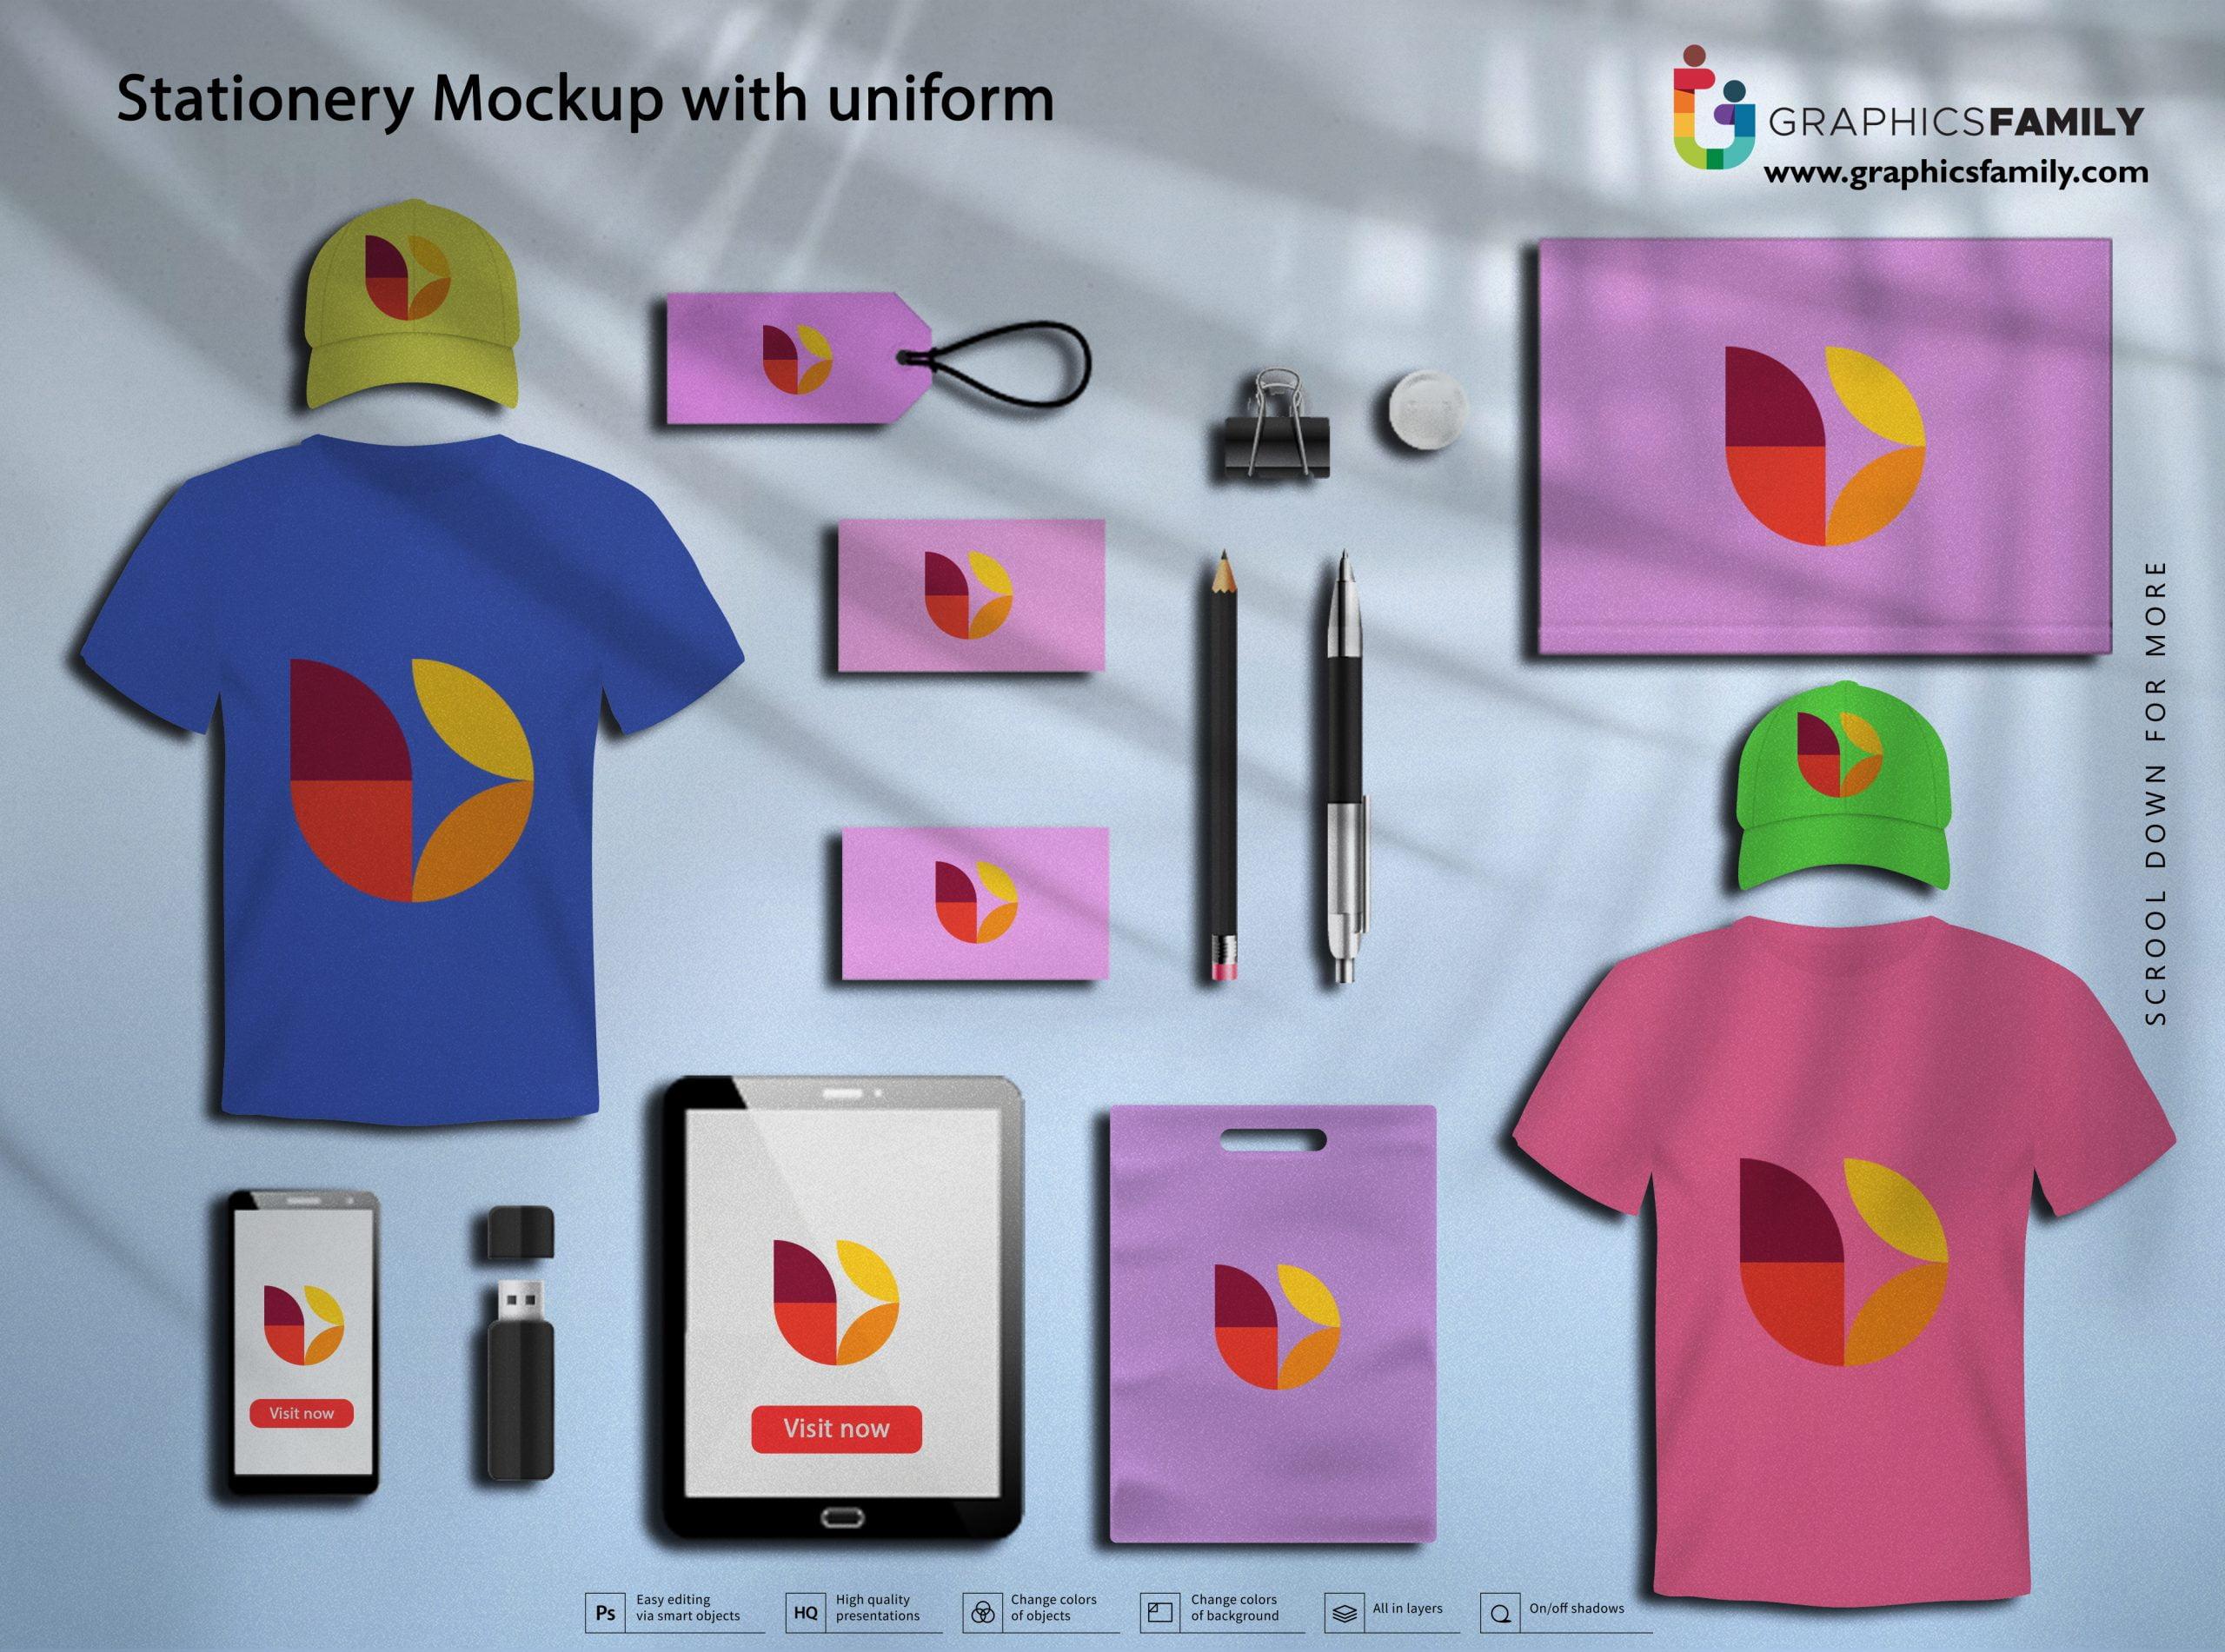 Free Stationery Mockup with Uniform